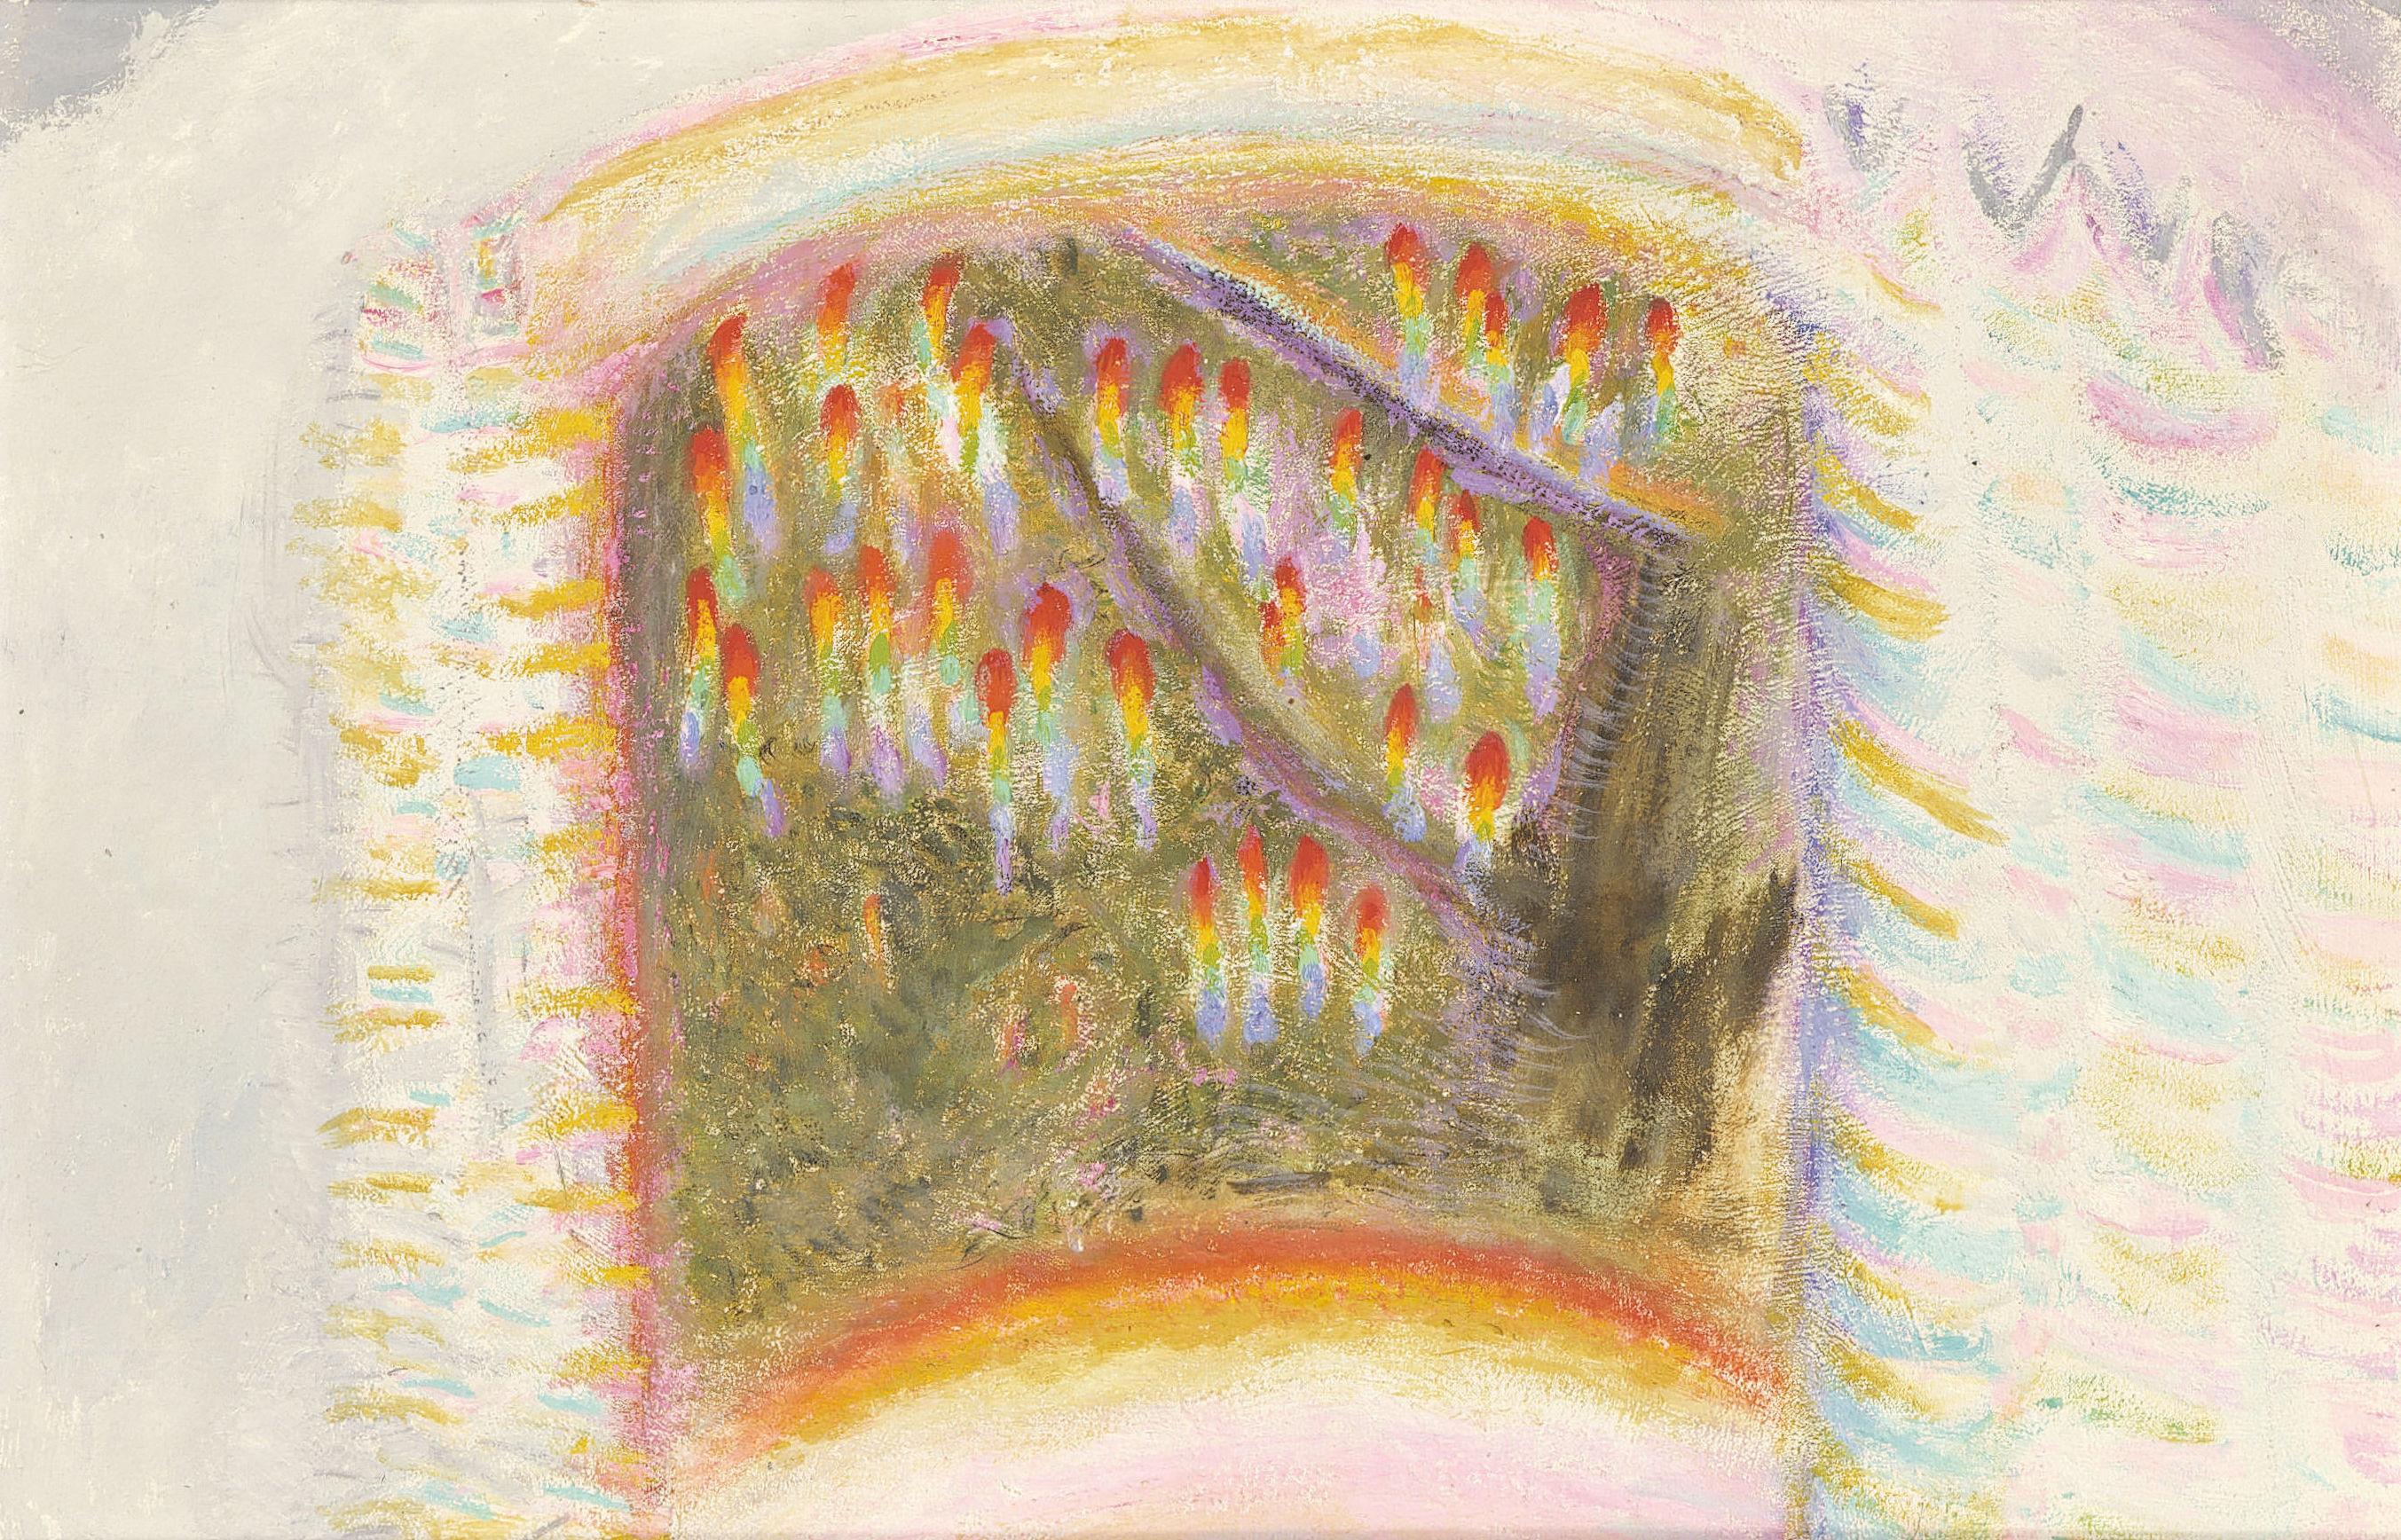 Winifred Nicholson First Prismatic Painting MIMA